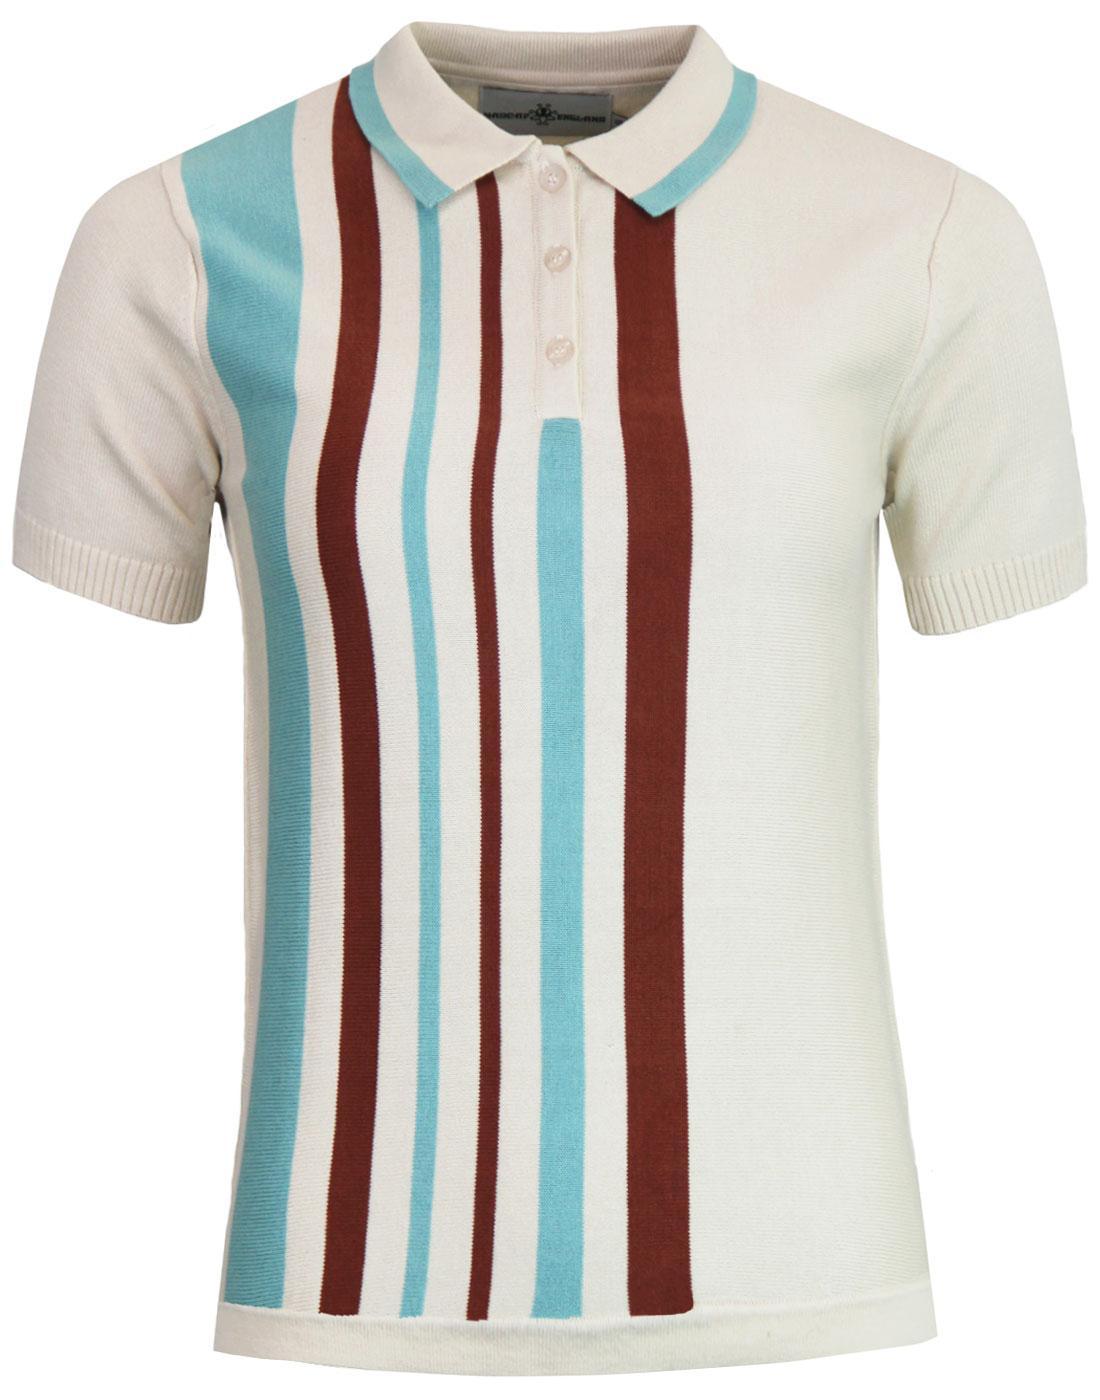 Bauhaus Belle MADCAP ENGLAND Mod Stripe Knit Polo